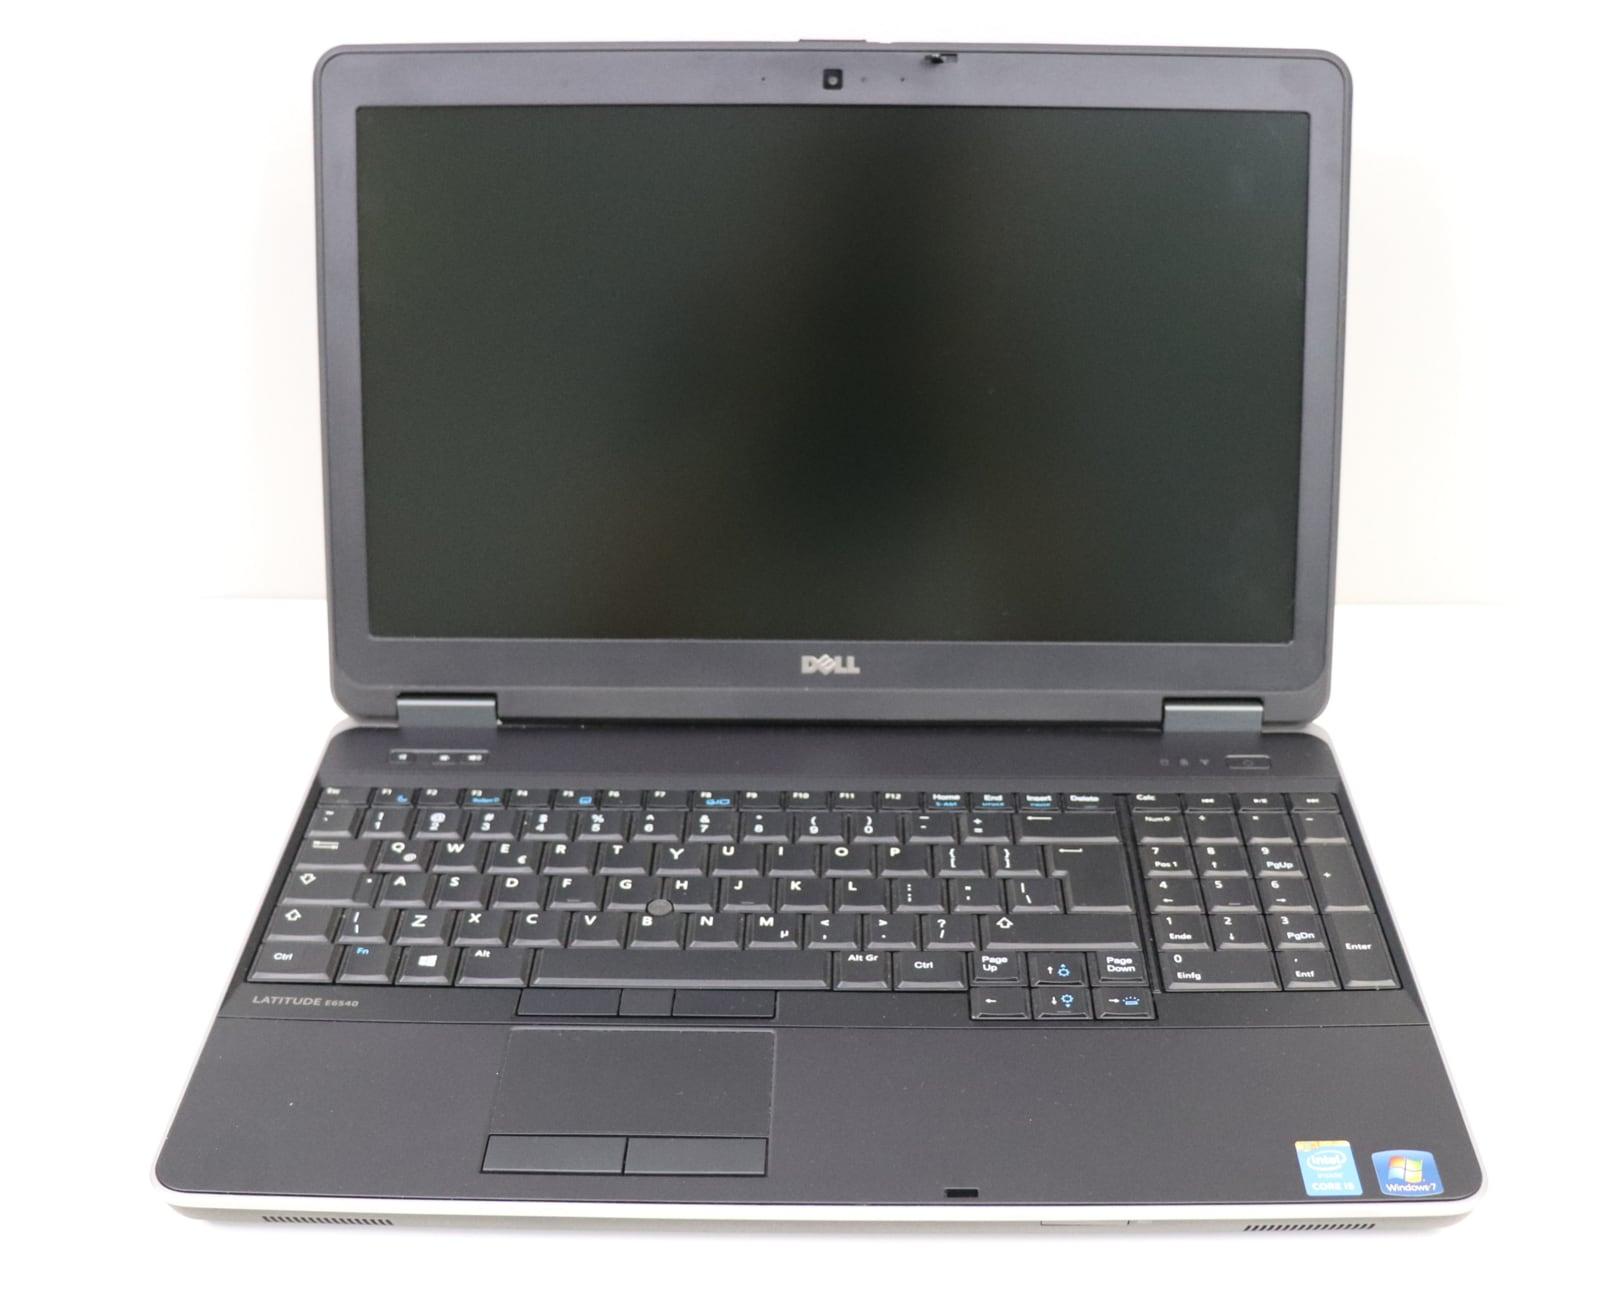 Laptop Dell Latitude E6540 i7 - 4 generacji / 16GB / 240 GB SSD / 15,6 HD / Klasa A- - 2